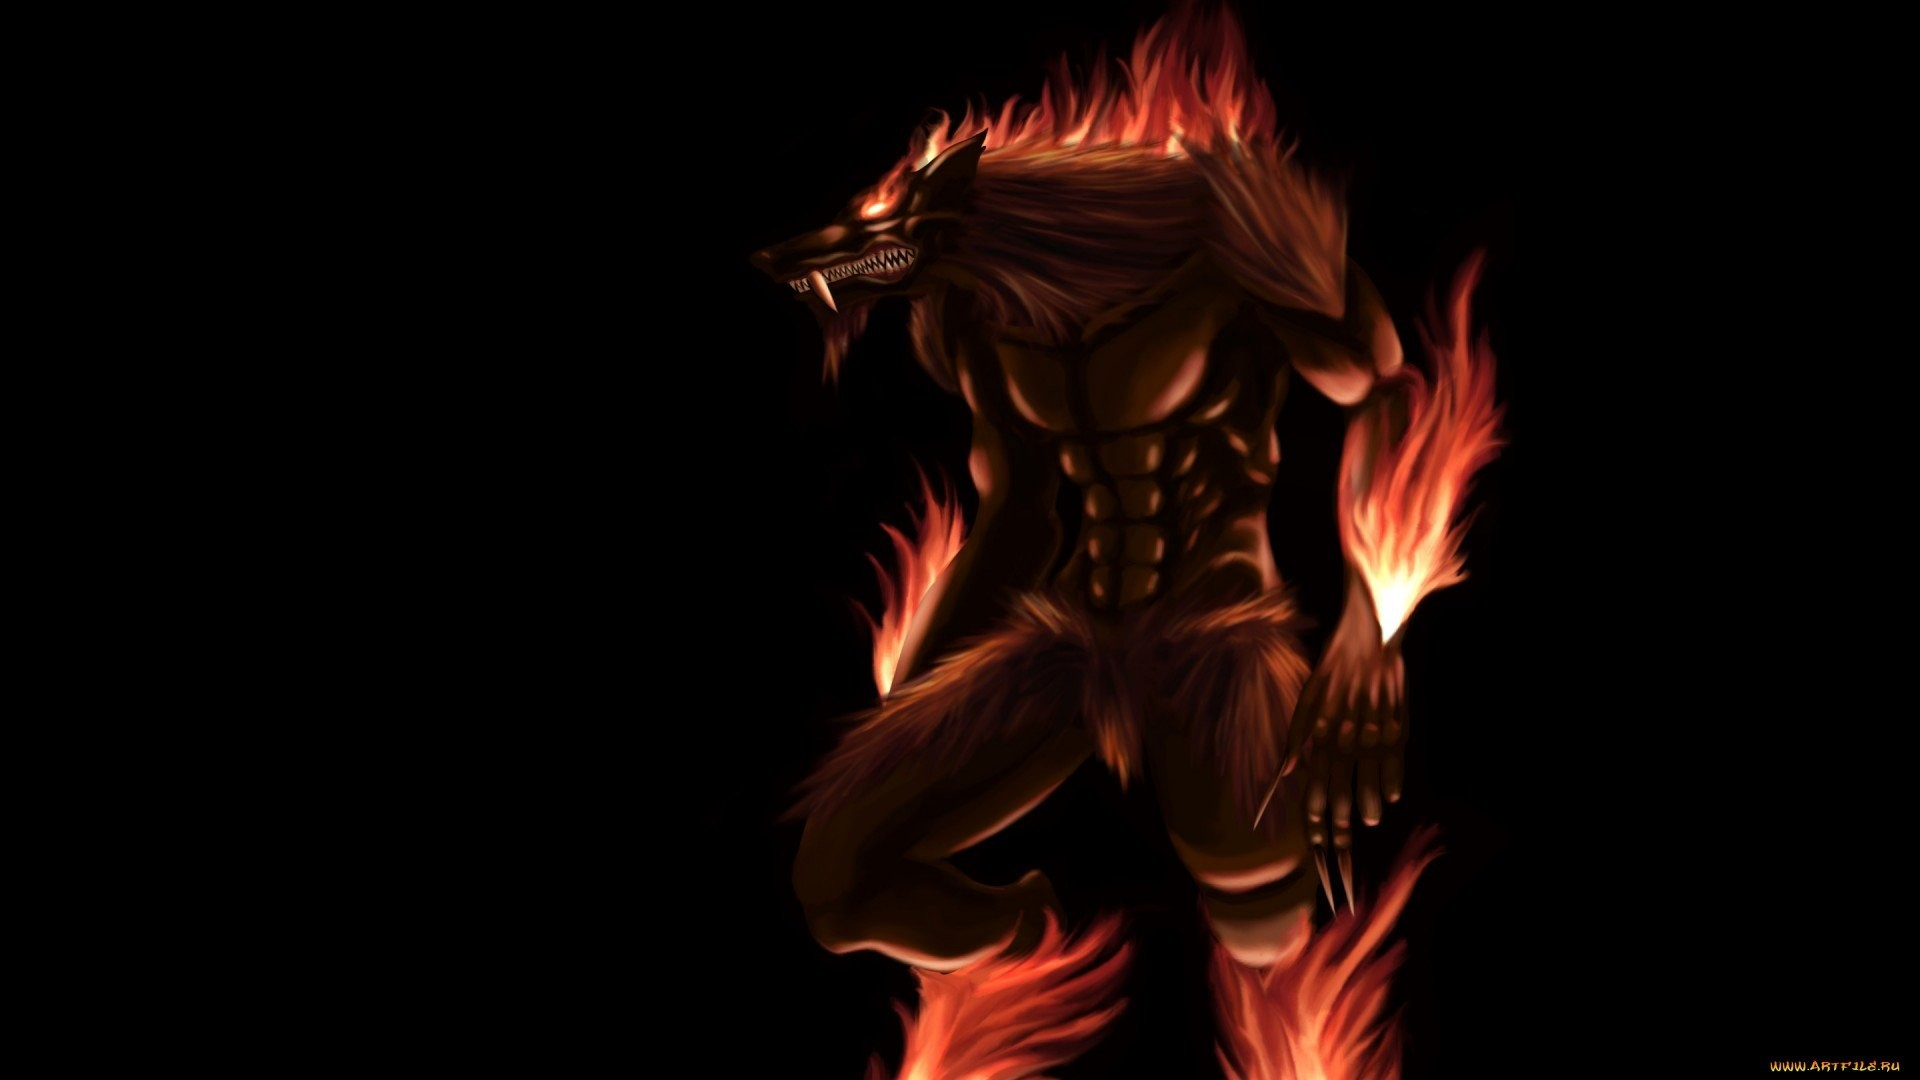 Werewolf Wallpaper At Dark Wallpapers